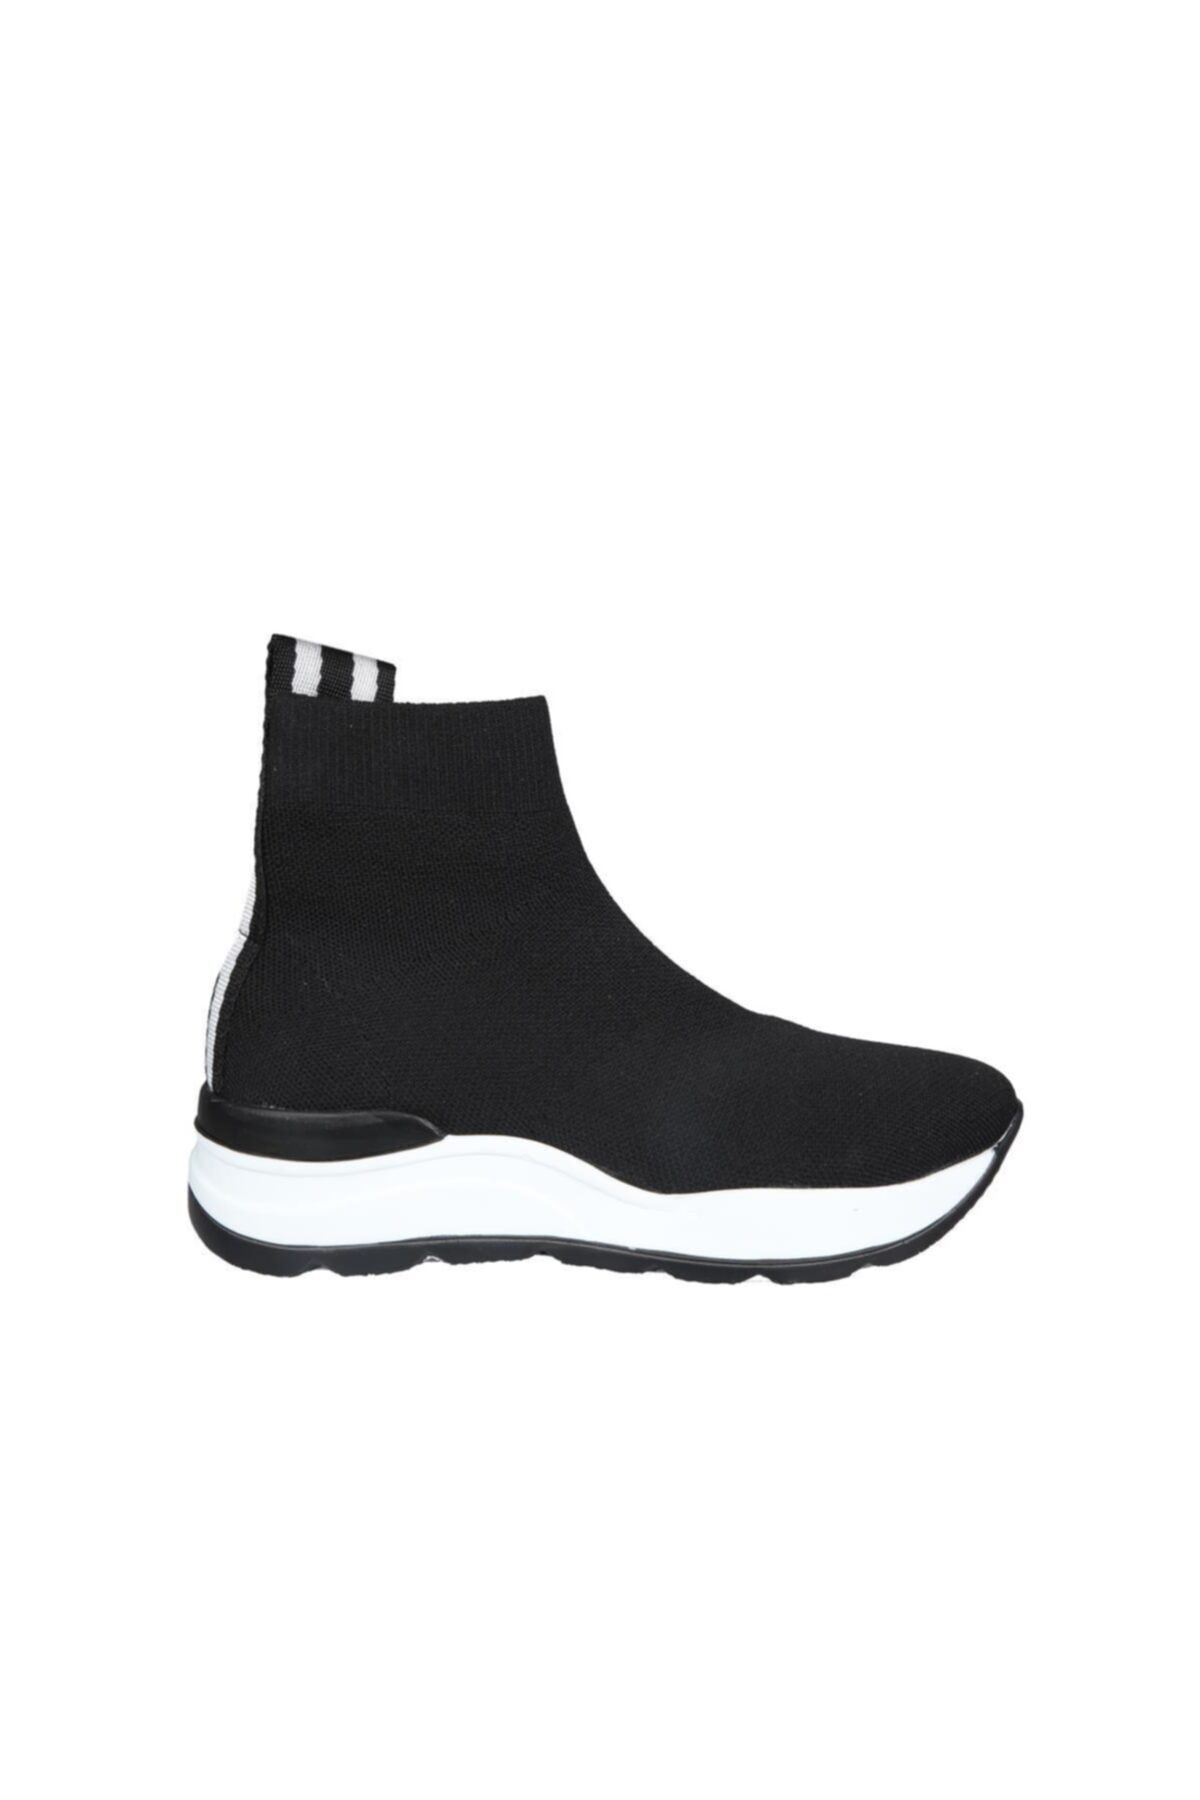 MİSS PARK MODA Kadın Siyah Sneakers